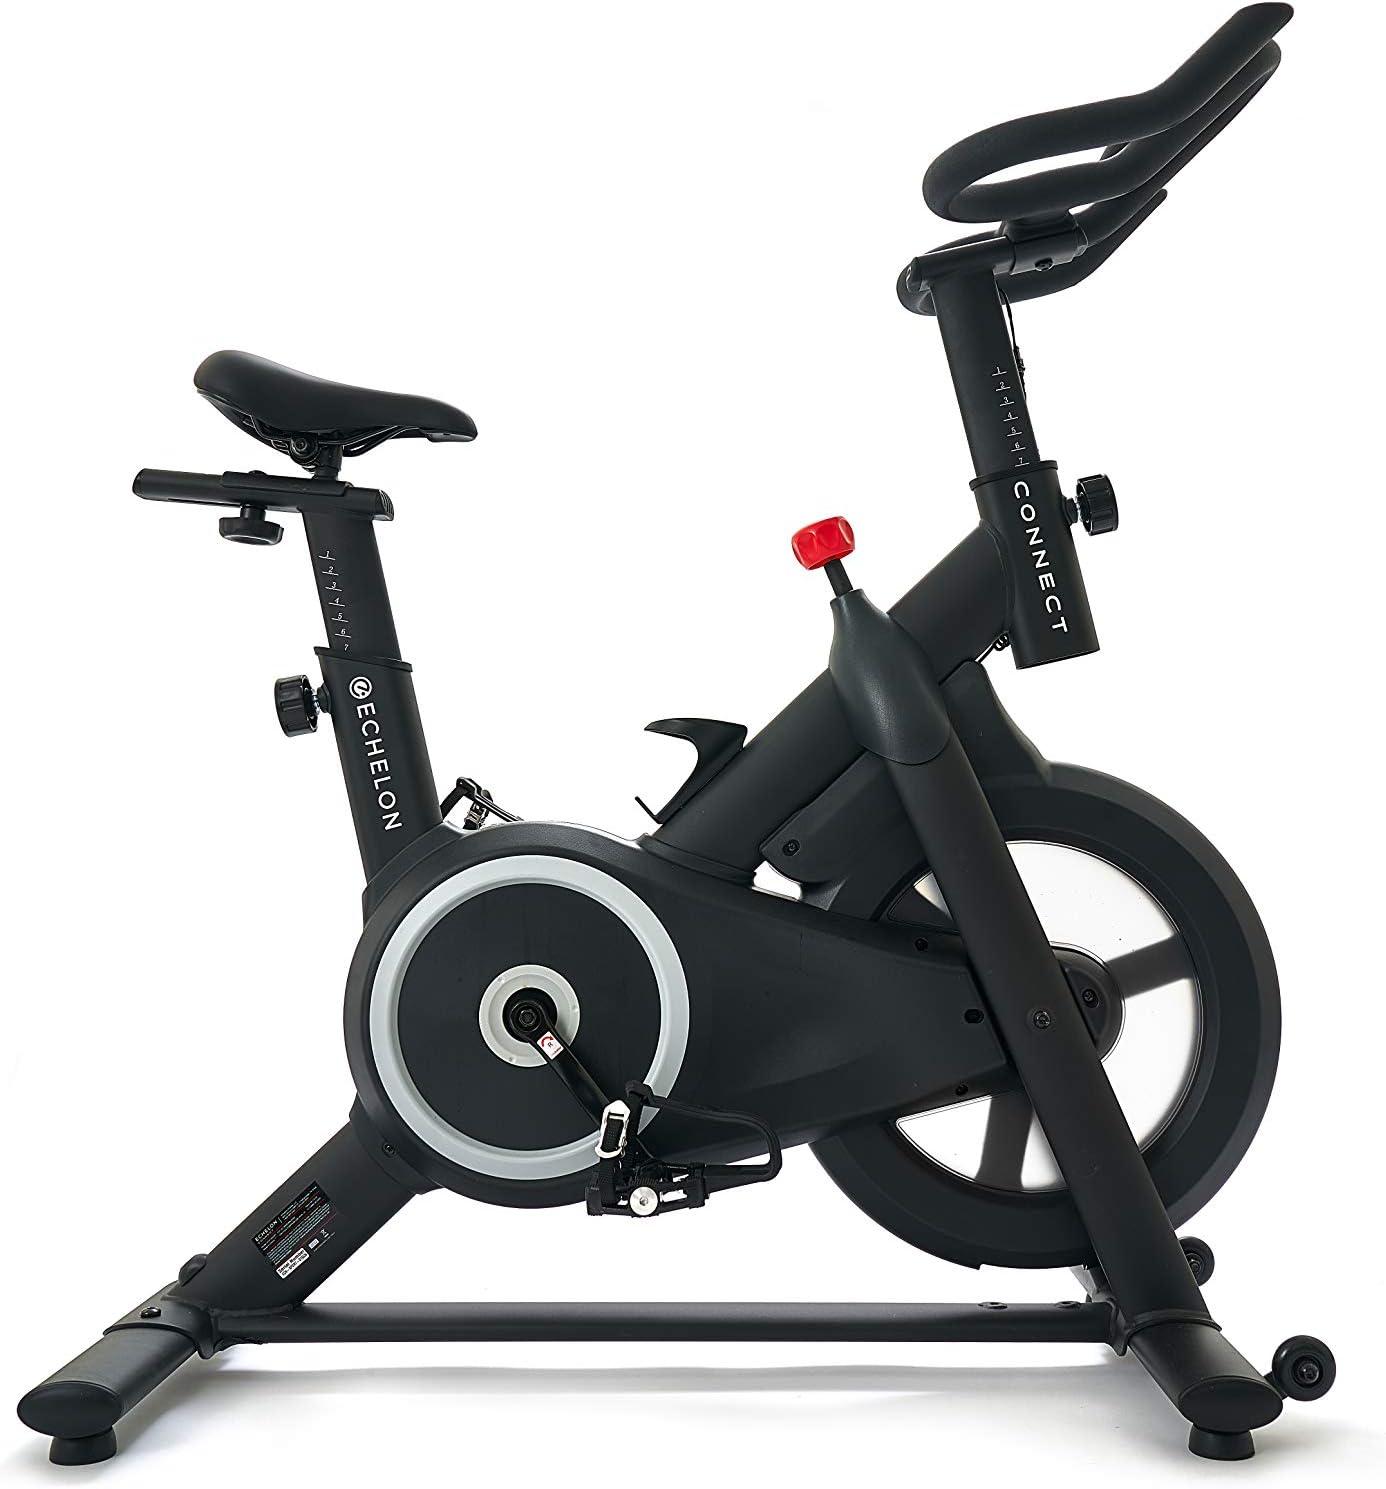 Echelon Smart Connect Fitness Bikes